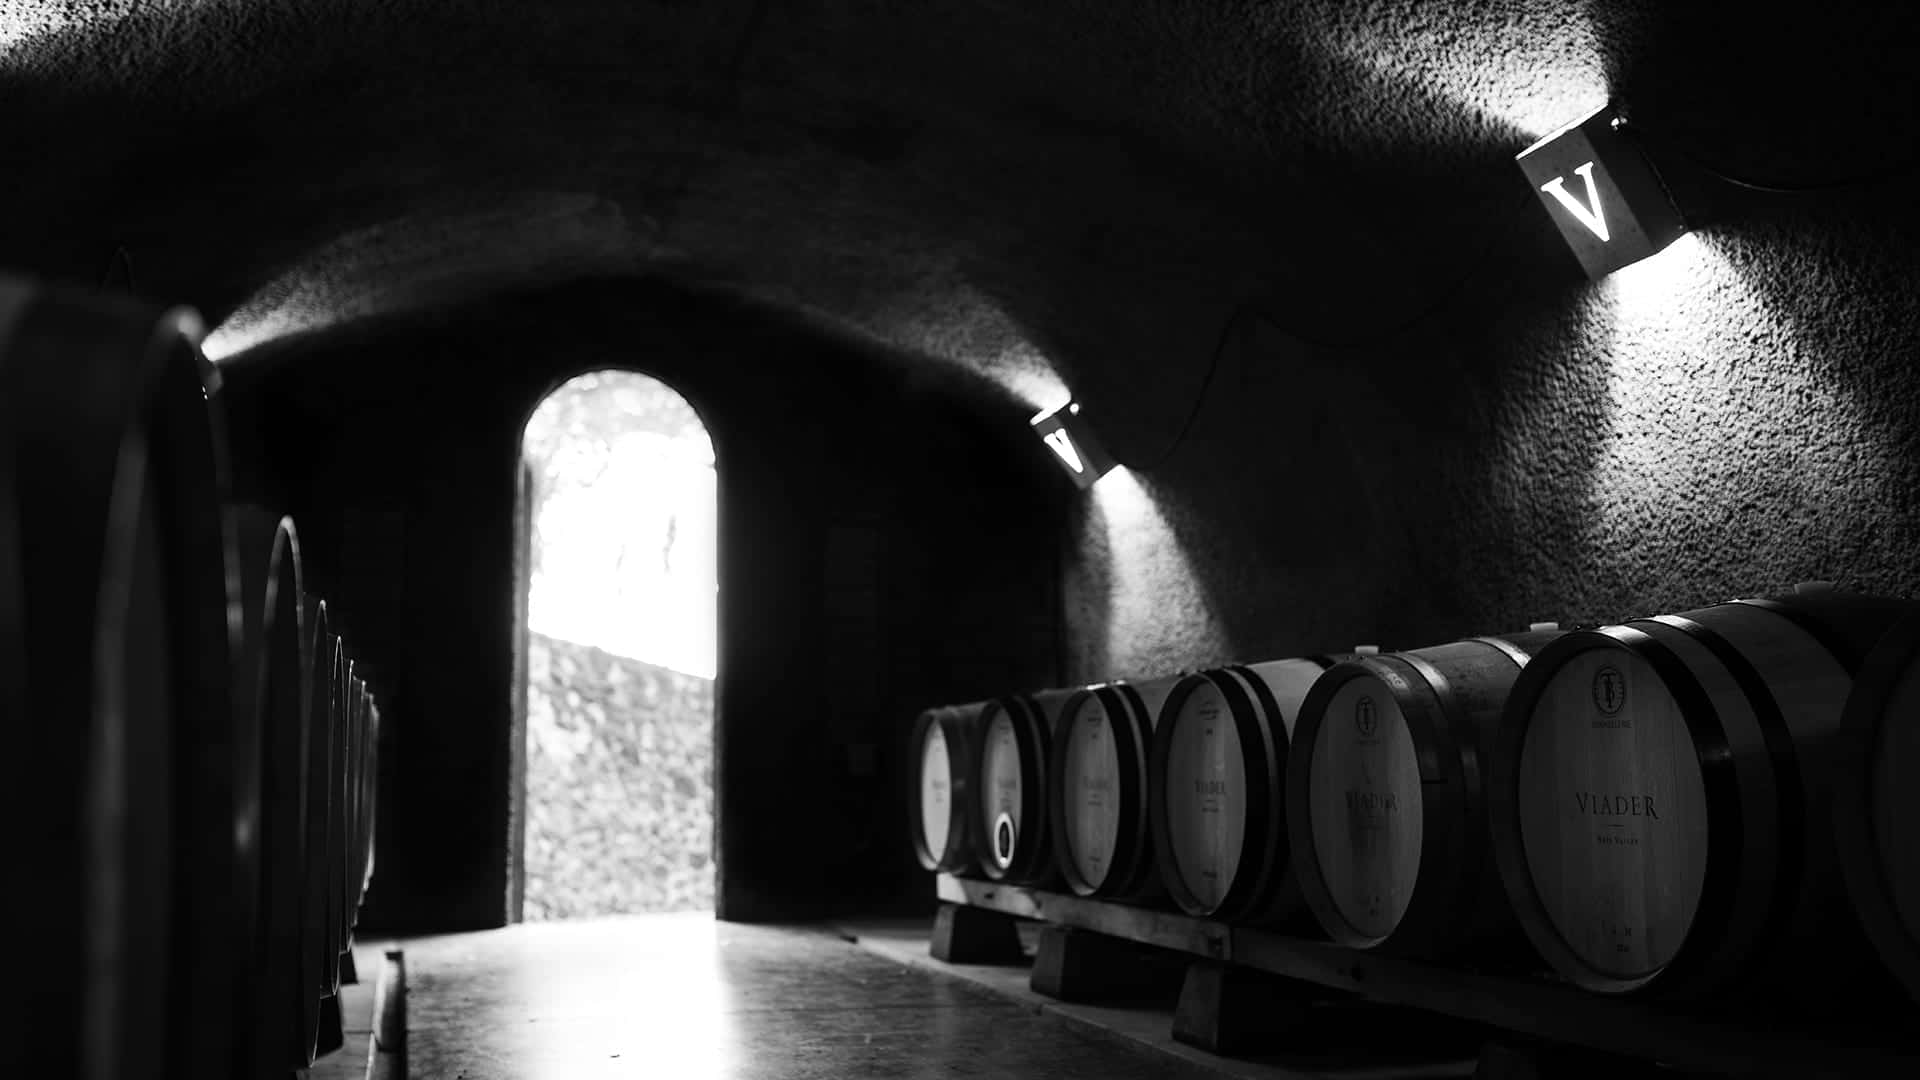 VIADER Vineyards and Winery